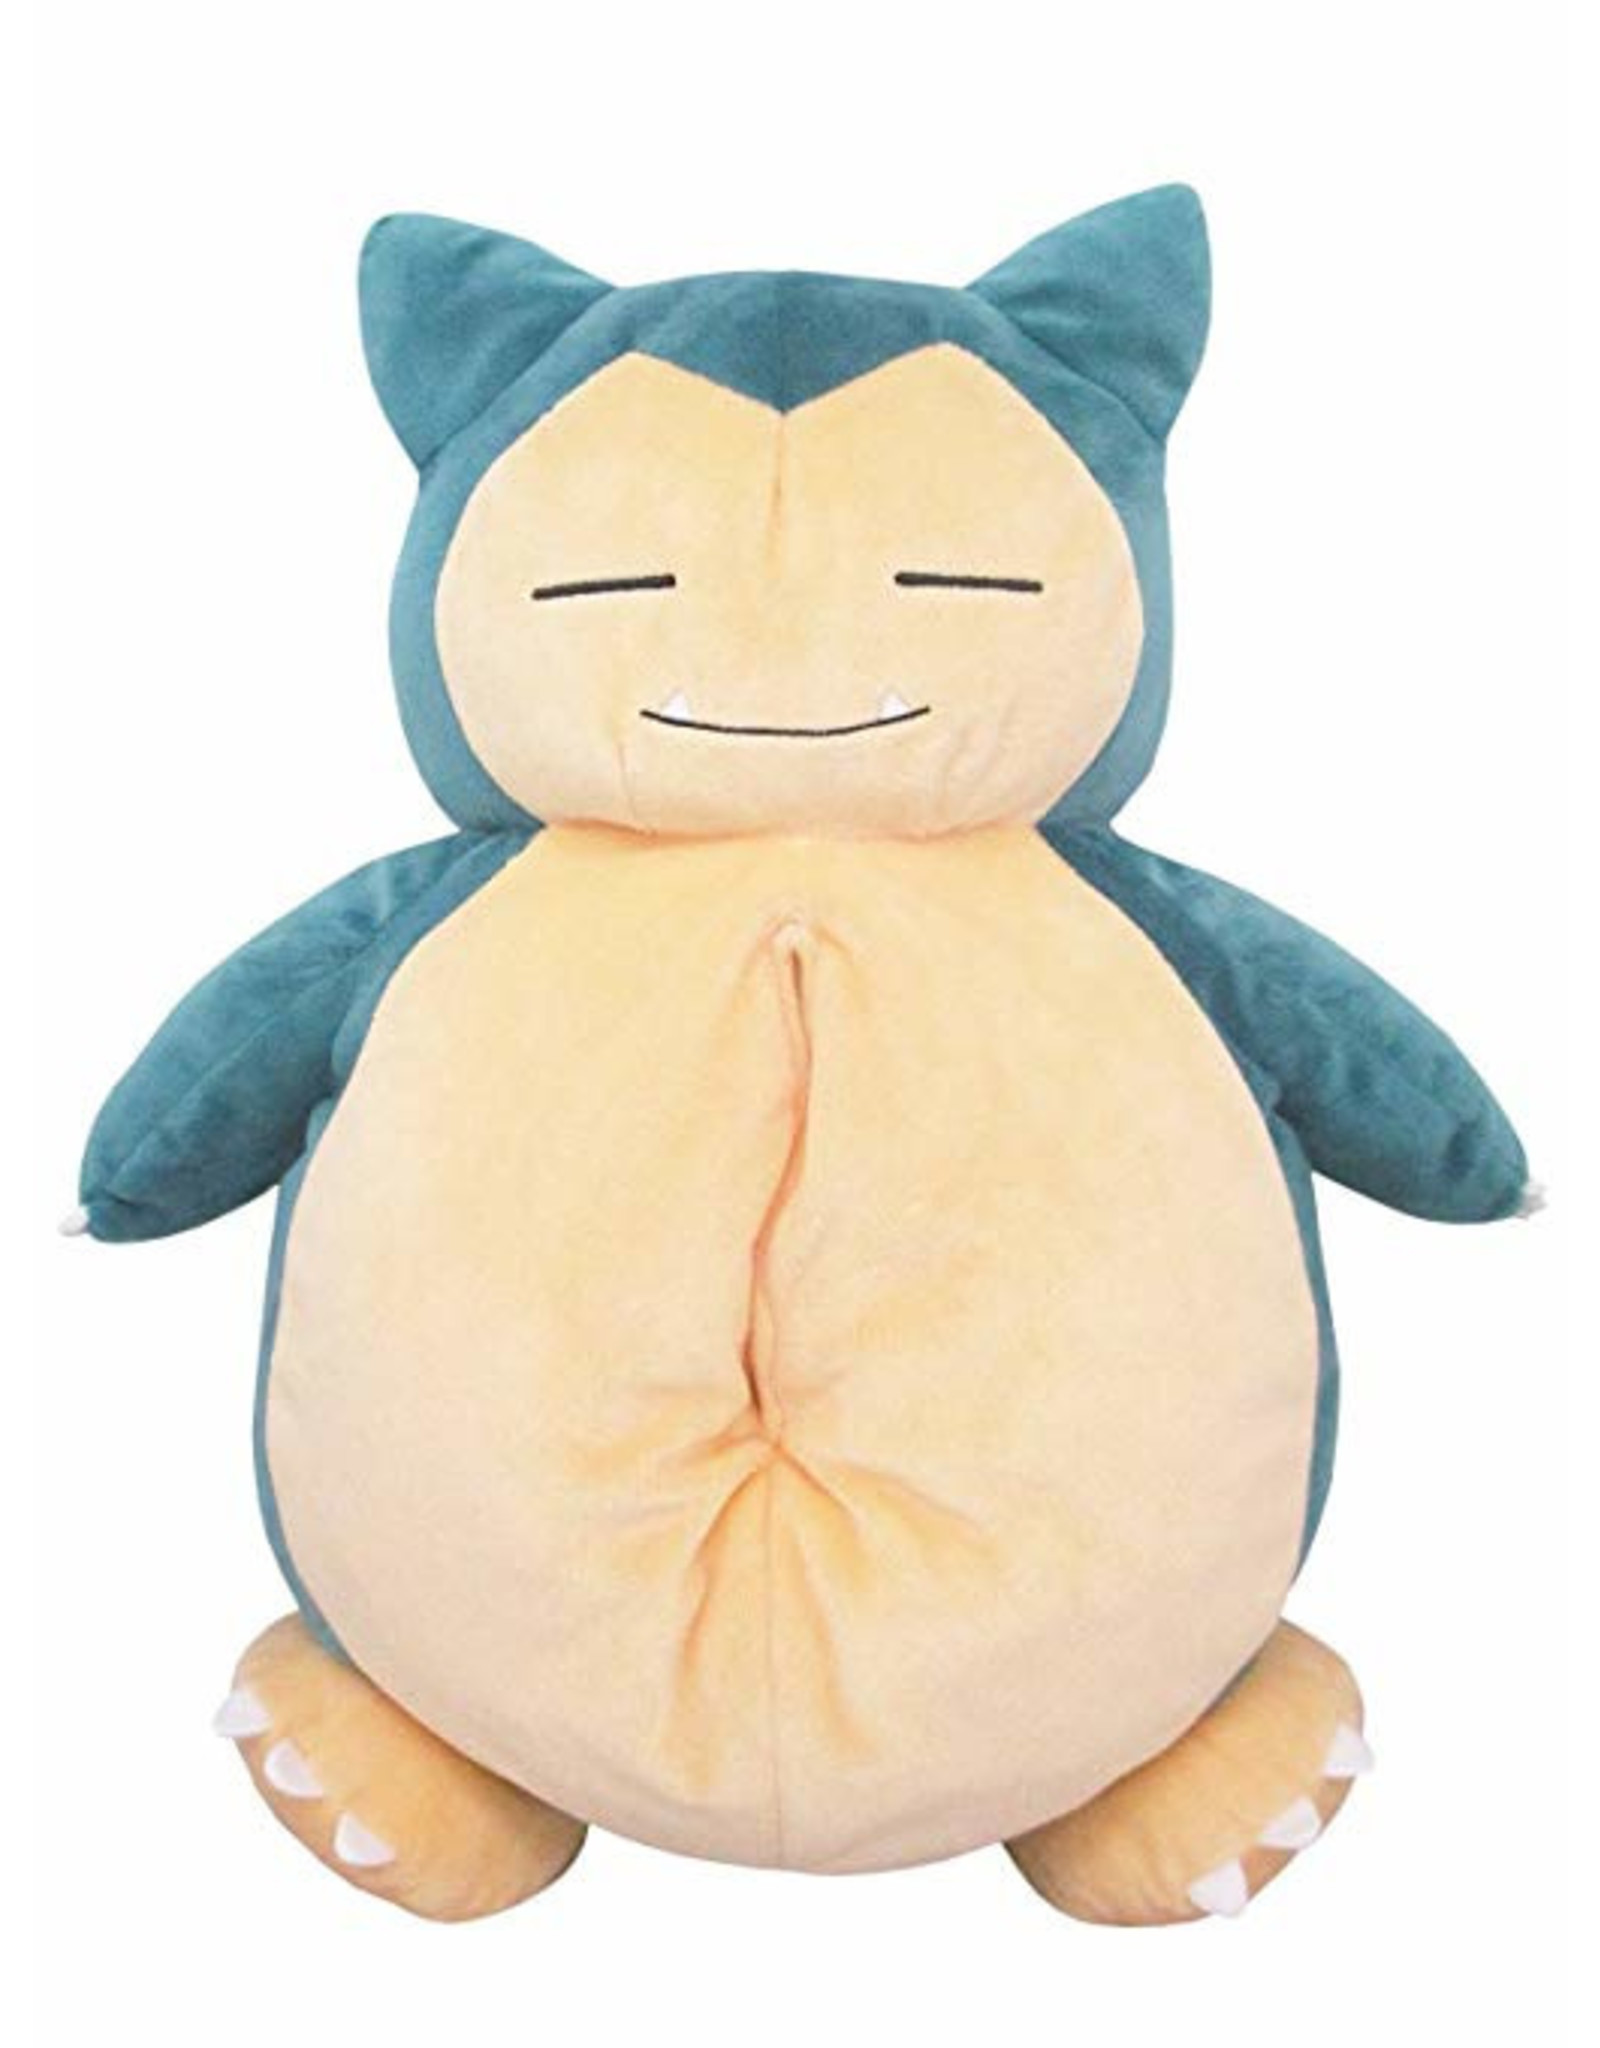 Snorlax Tissue Box Cover - Pokemon Plushie - 45cm (Japanese import)